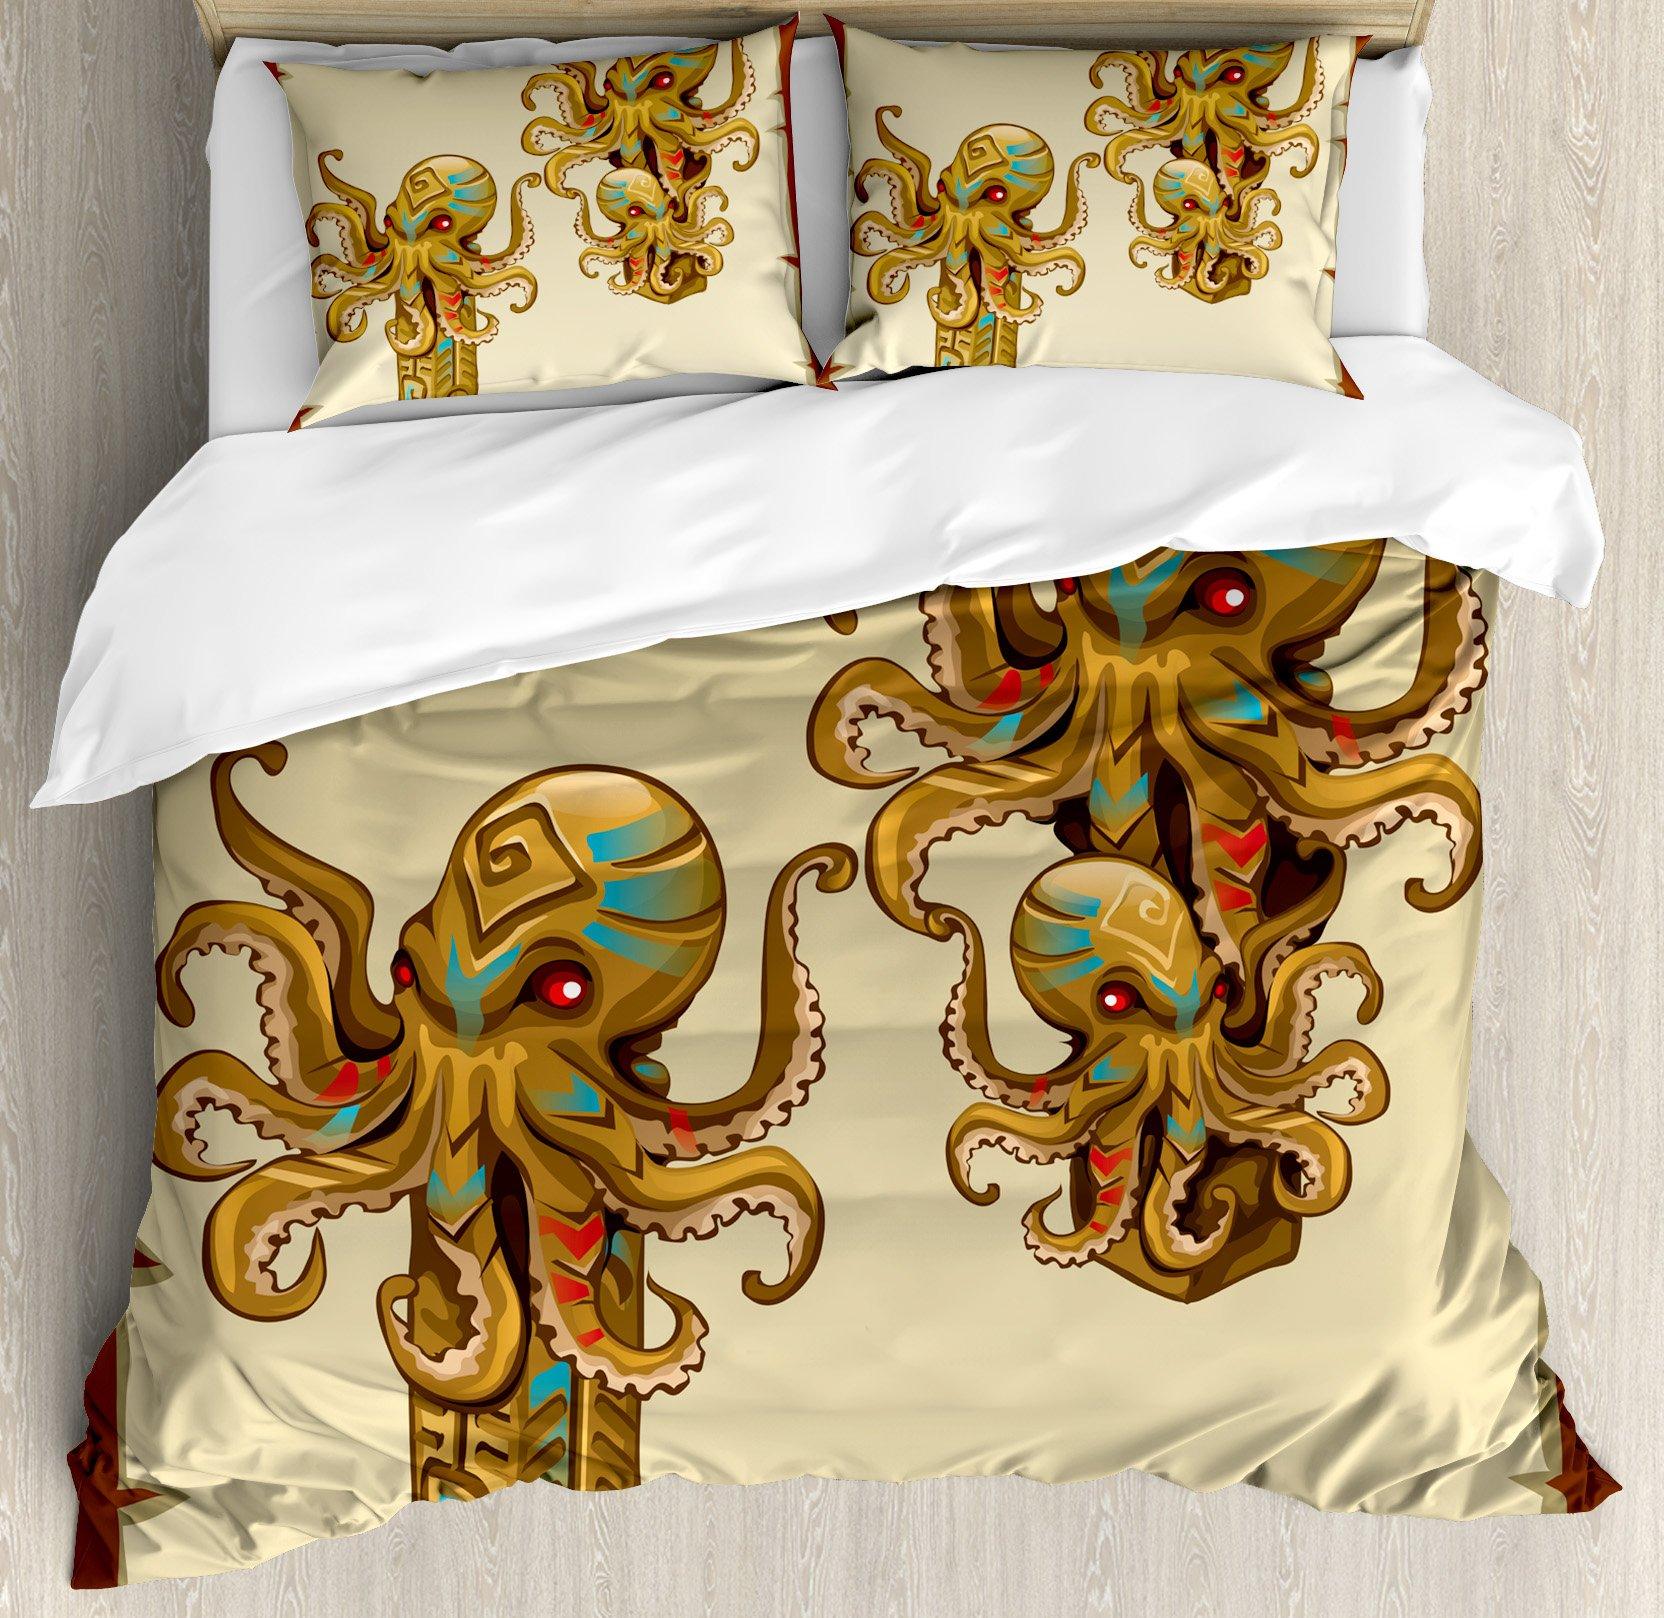 Ambesonne Octopus Decor Duvet Cover Set, Cartoon Art Tribal Monster Kraken Octopus Sculpture Ornament Illustrations Sea Creature Print, 3 Piece Bedding Set with Pillow Shams, Queen/Full, Brown